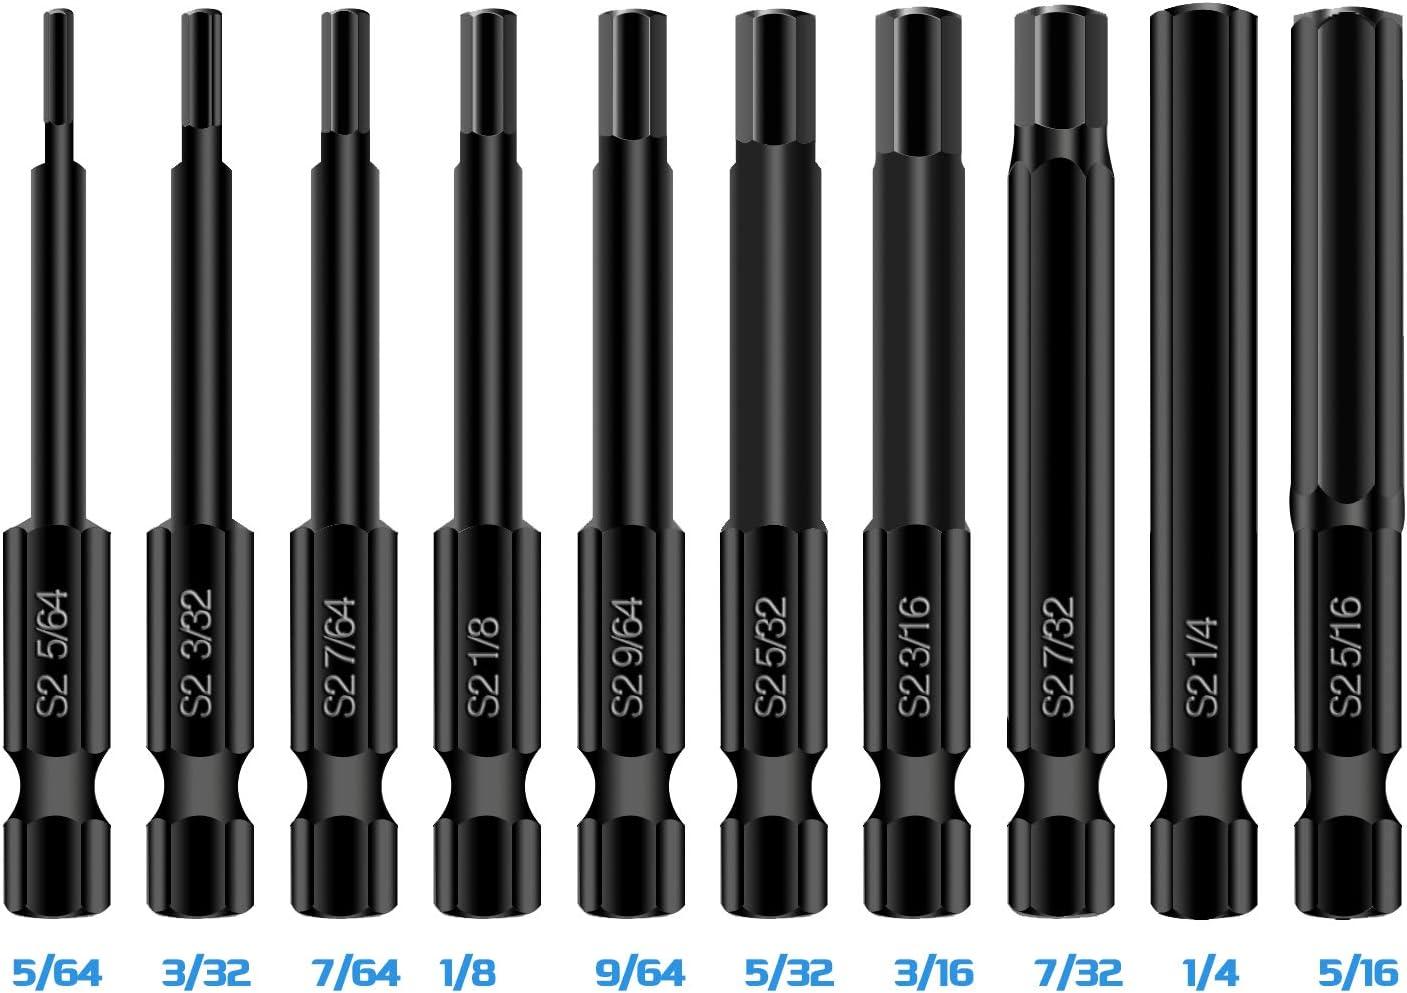 Mgtgbao Magnetic 1//4 Inch Hex head Screwdriver Bit Set Tips . 50mm Length 10PCS Hex Head Allen Wrench Drill Bit Set